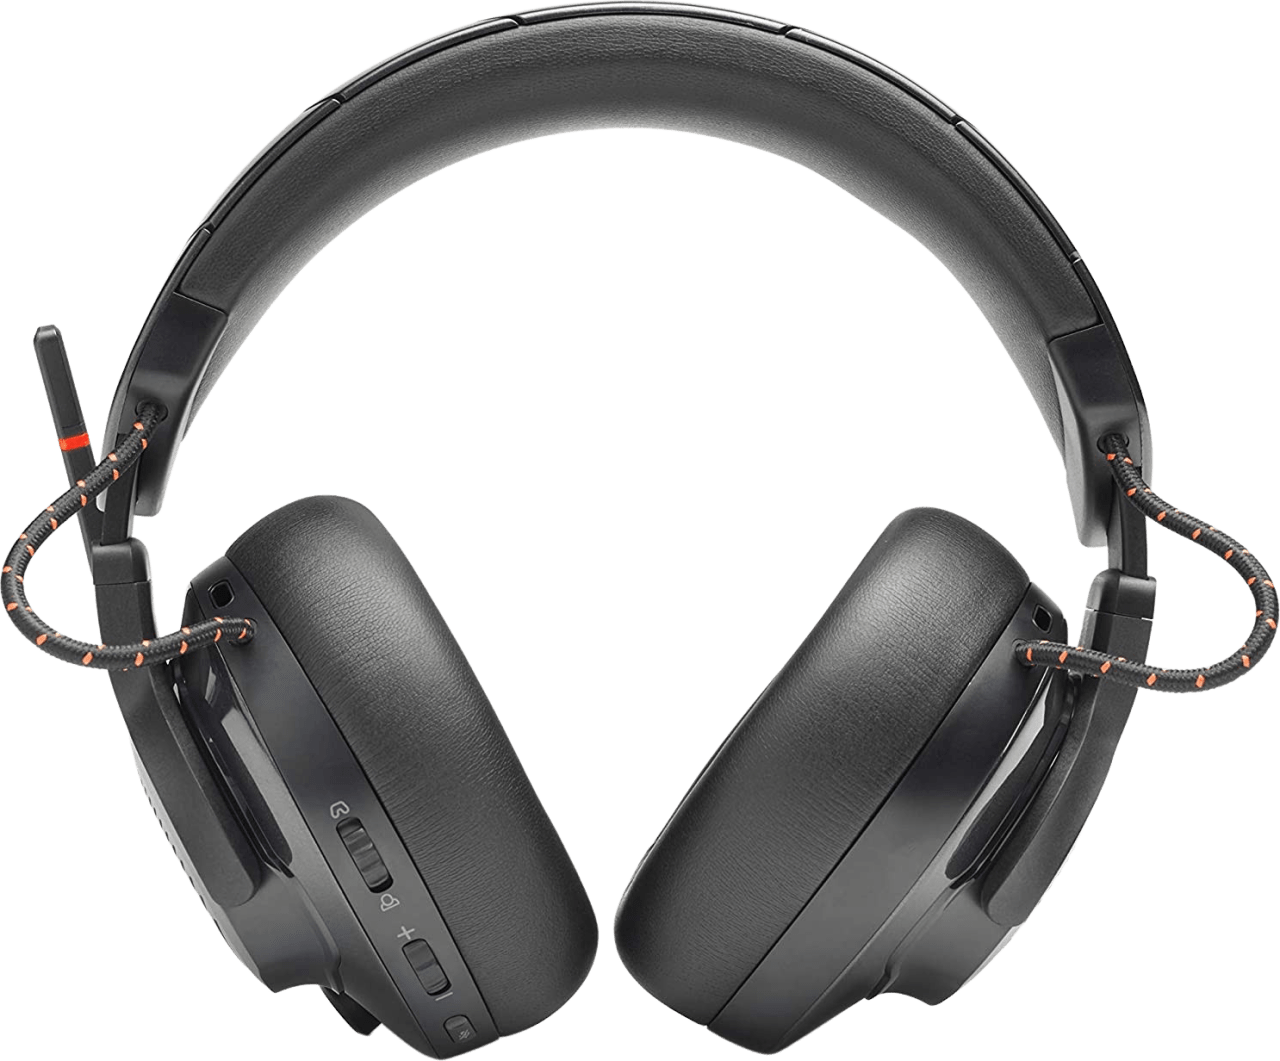 Black JBL Quantum 600 Over-ear Gaming Headphones.2